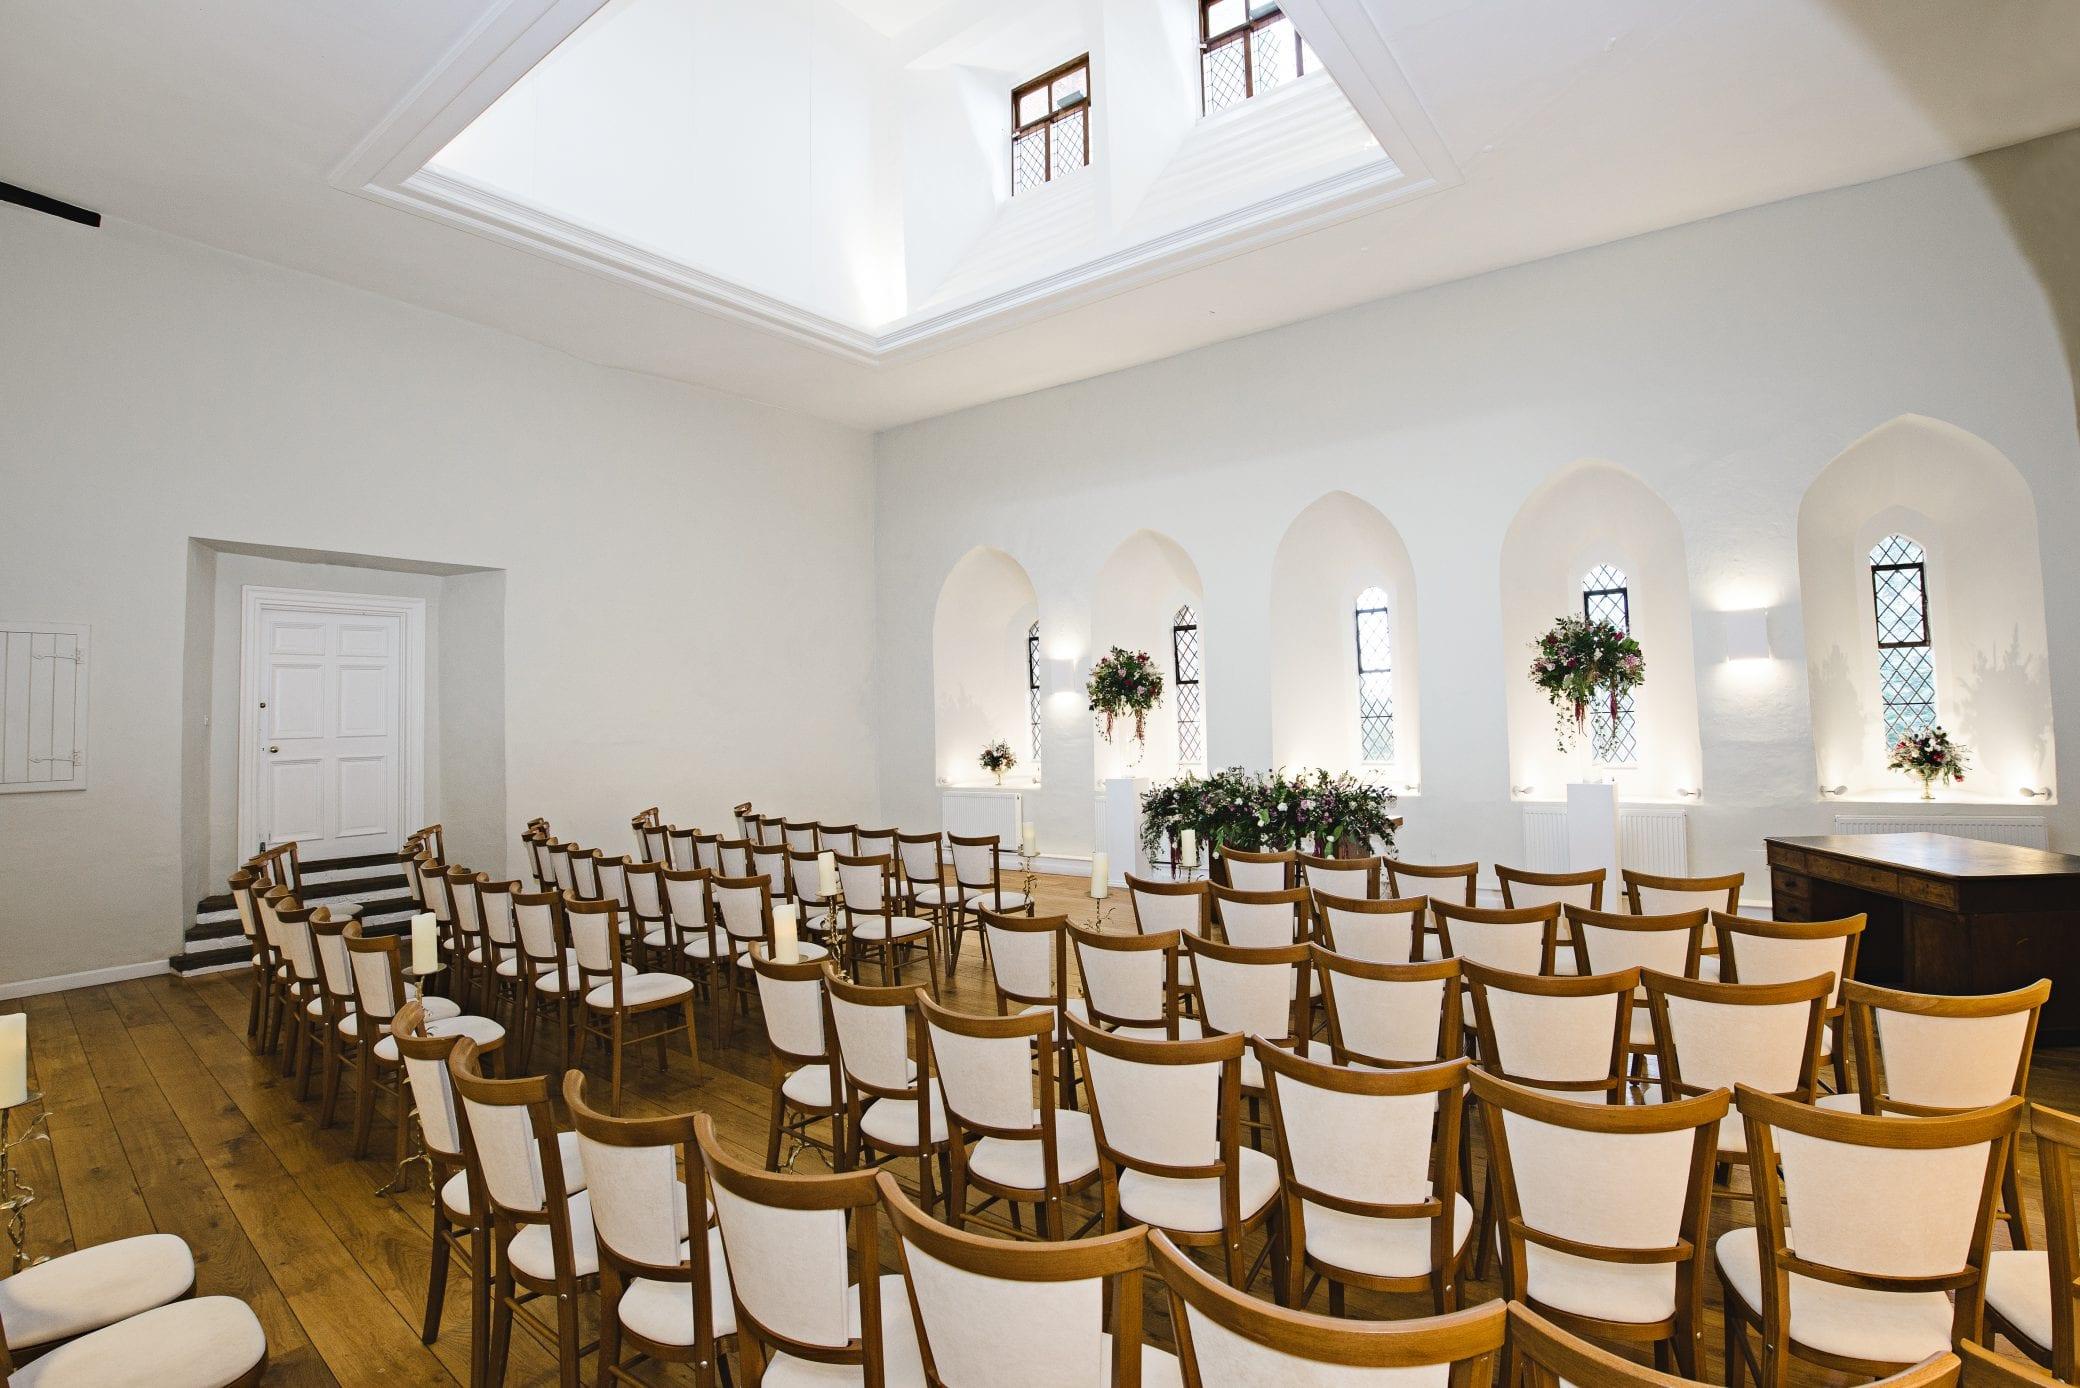 Wedding ceremony room at Farnahm Castle in Surrey